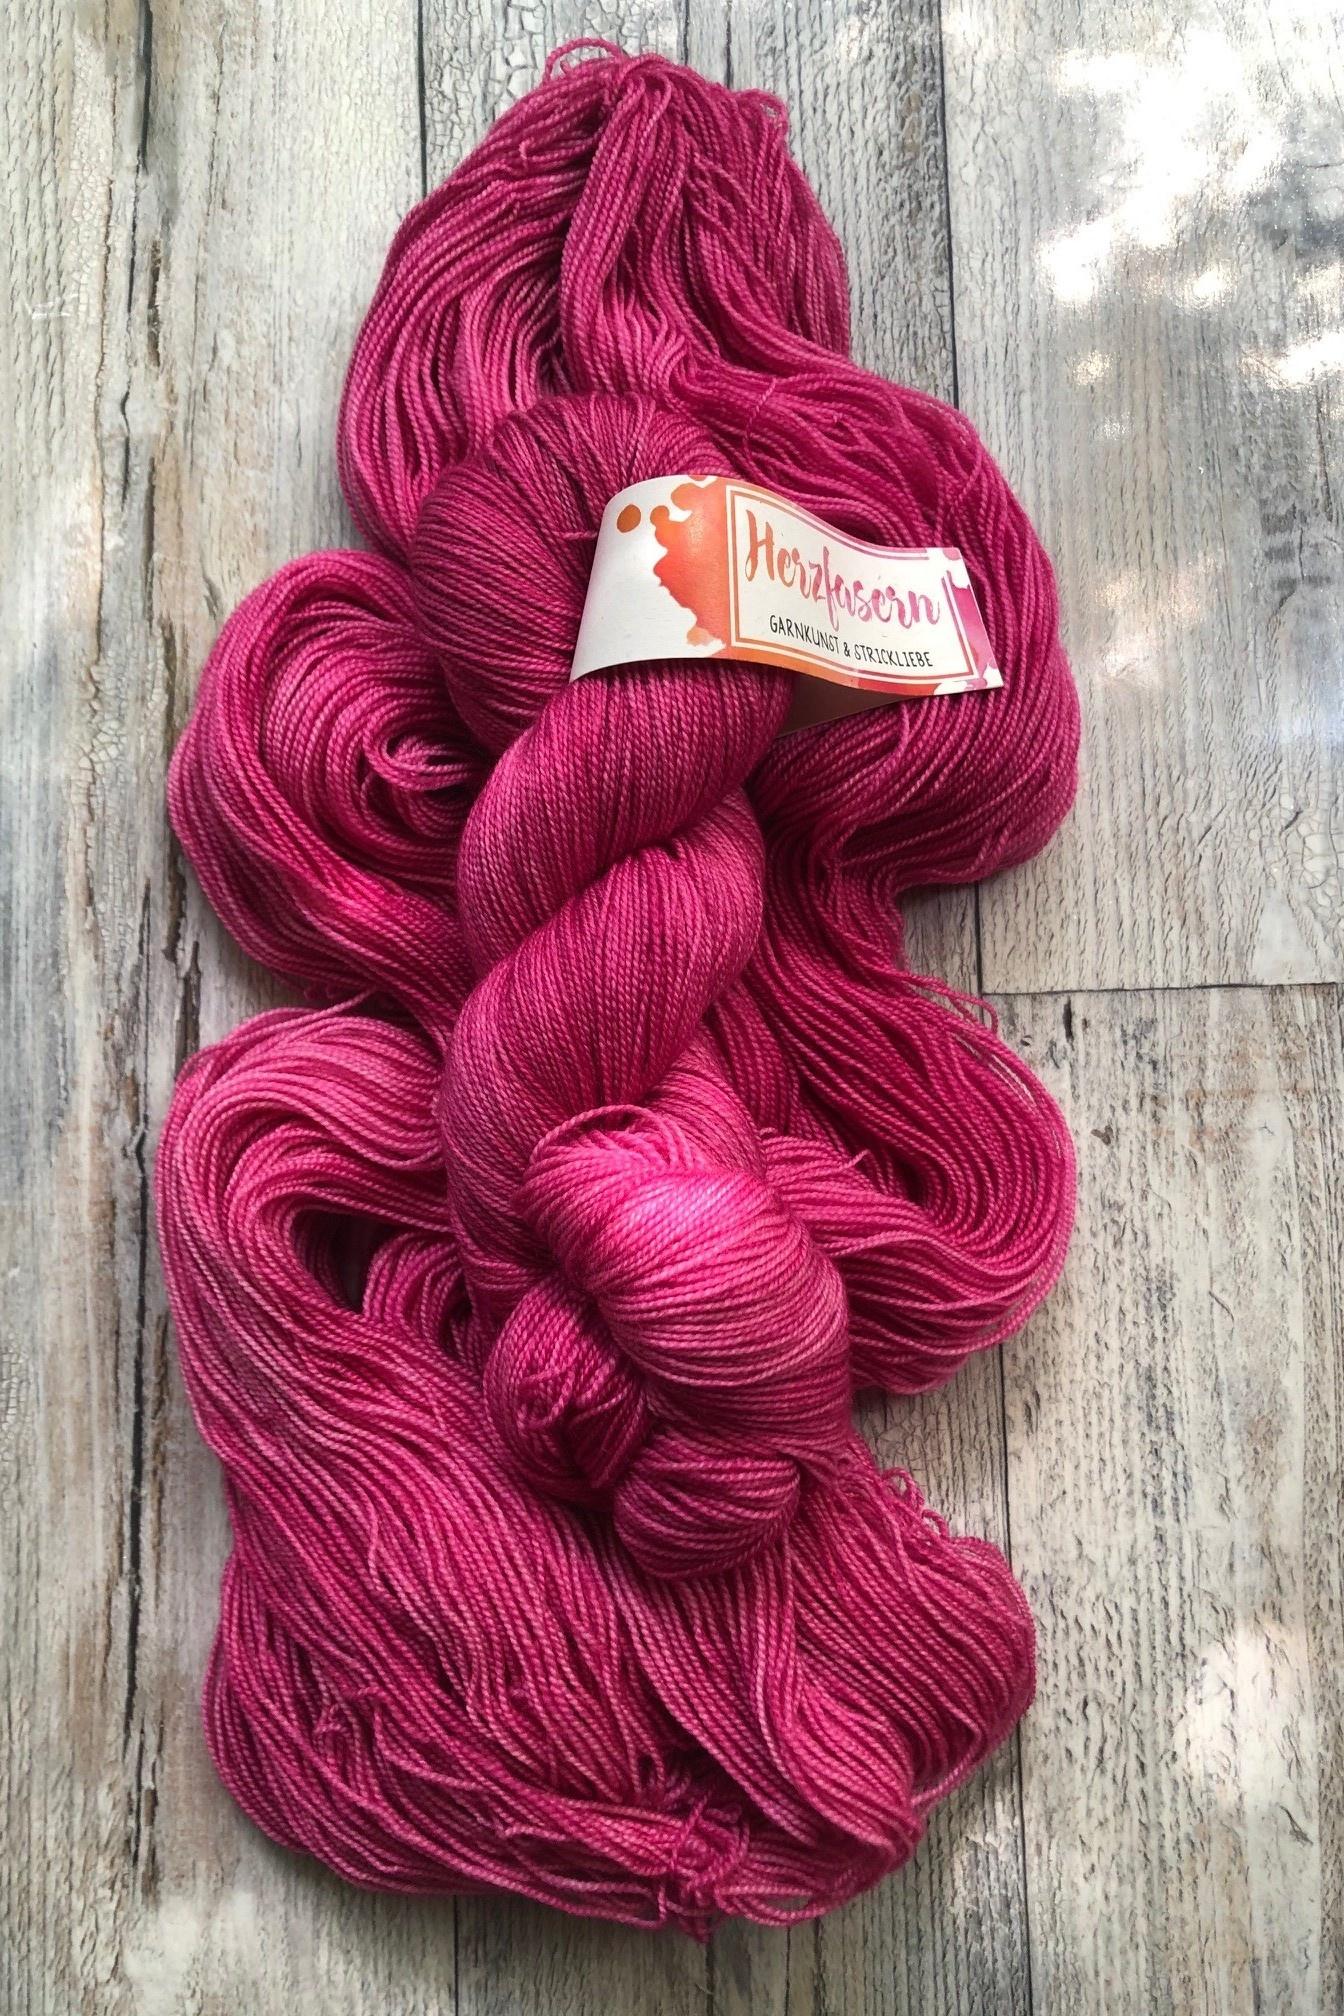 Lace Merino 600 -  Raspberry